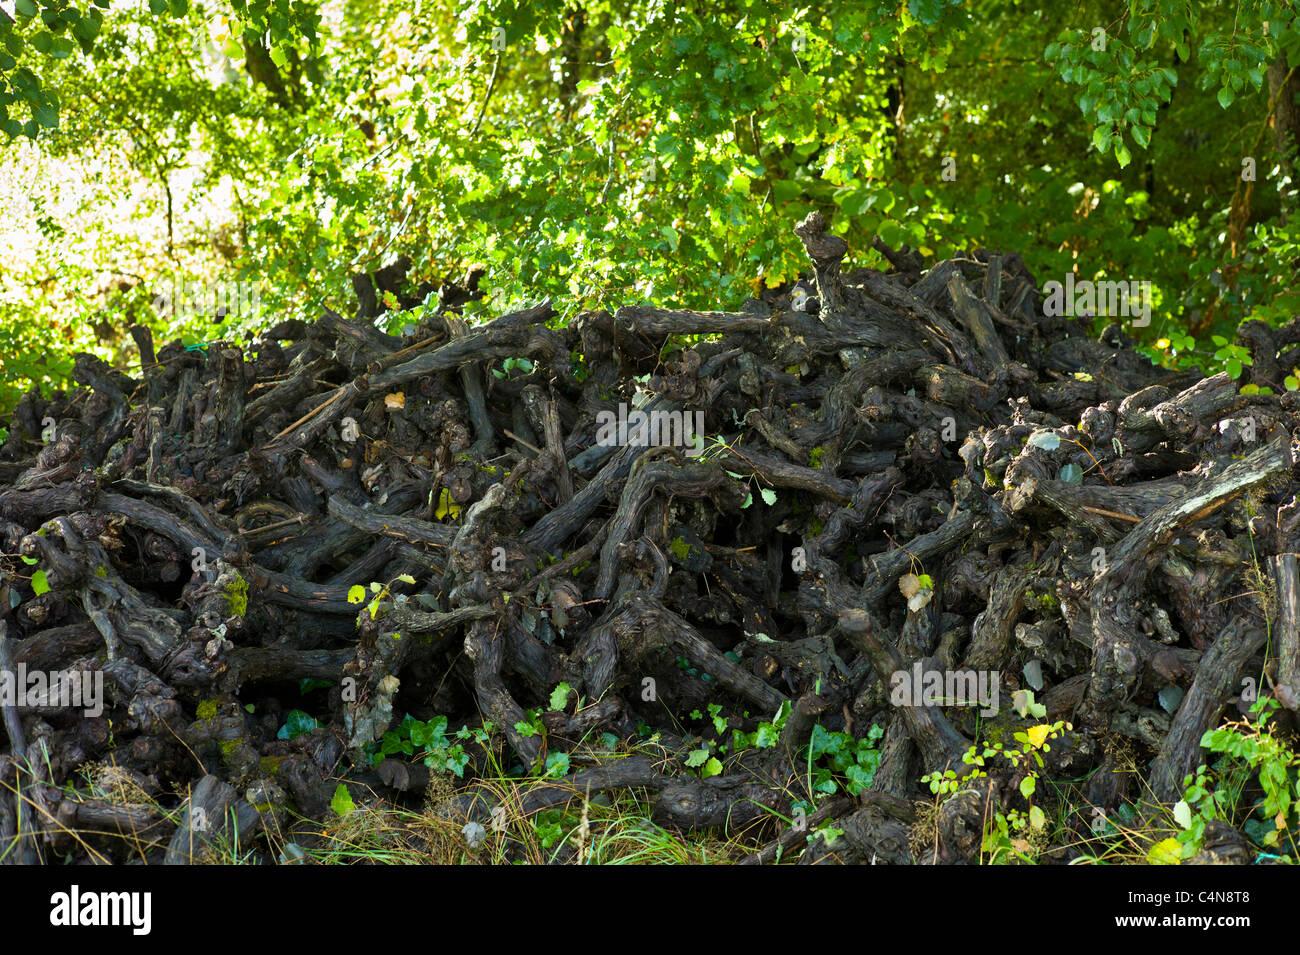 Stumps of old pruned vine stalks in wine region of Bordeaux, France - Stock Image